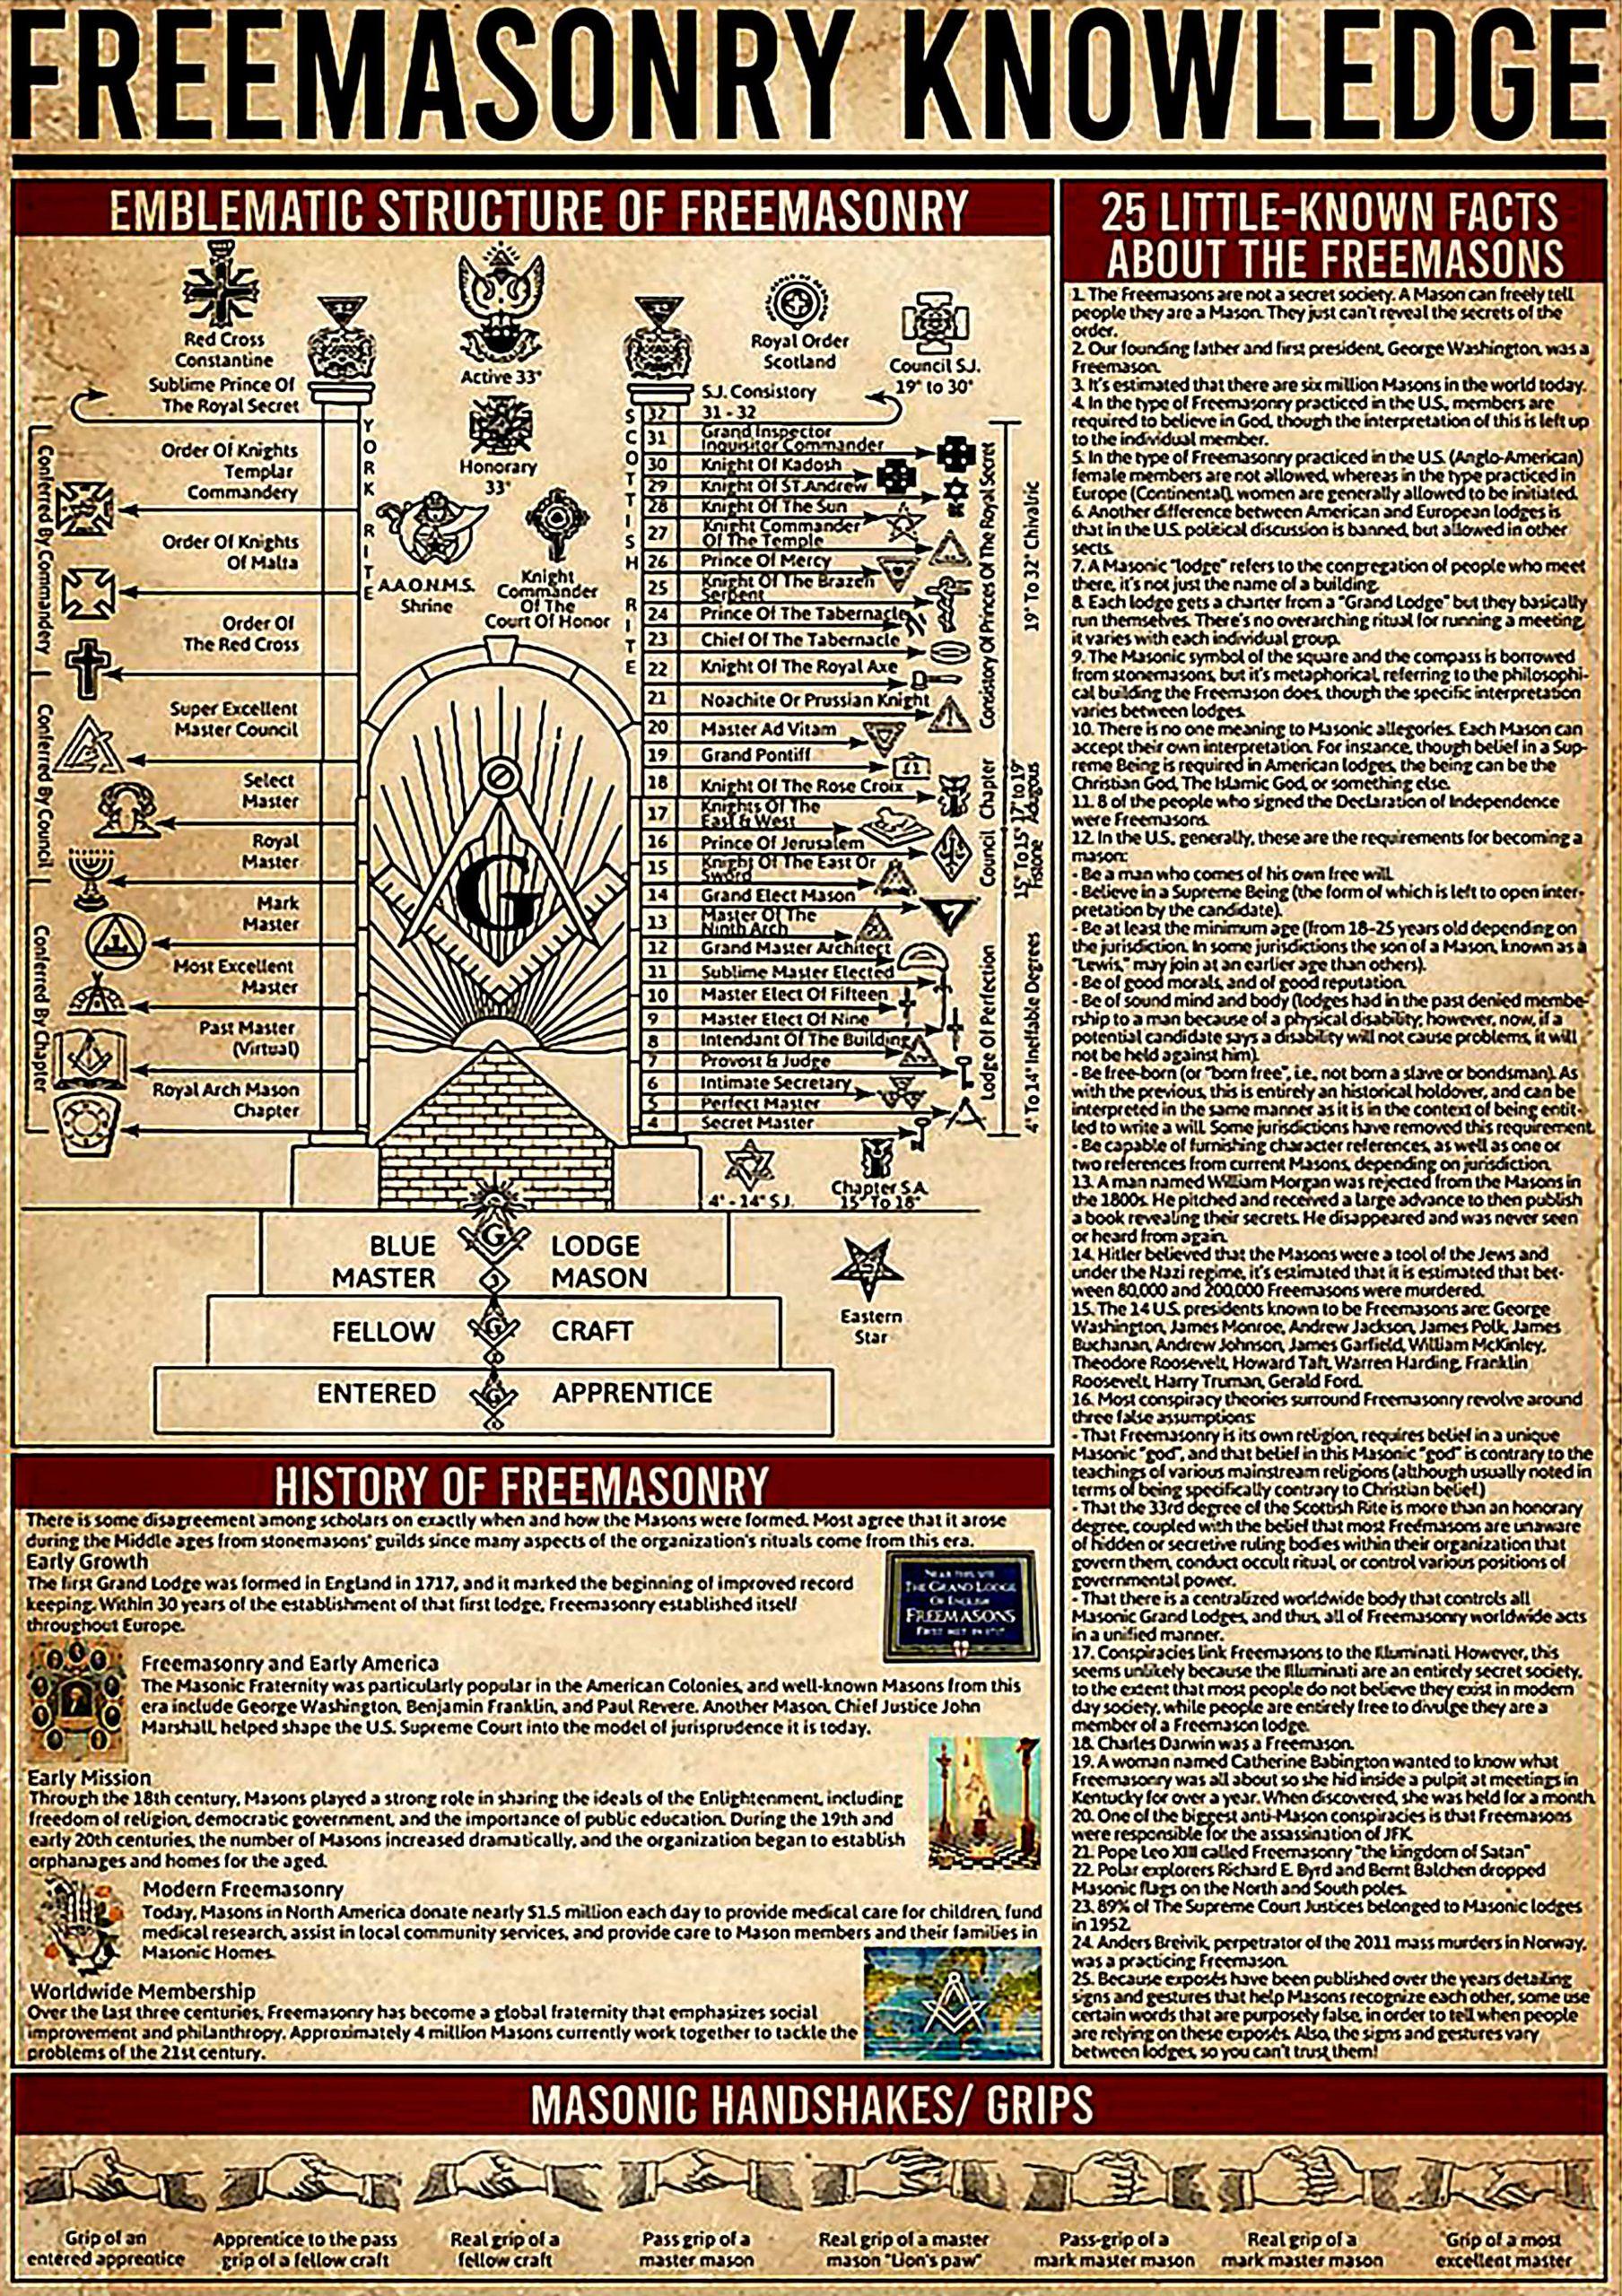 vintage freemasonry knowledge poster 1 - Copy (3)